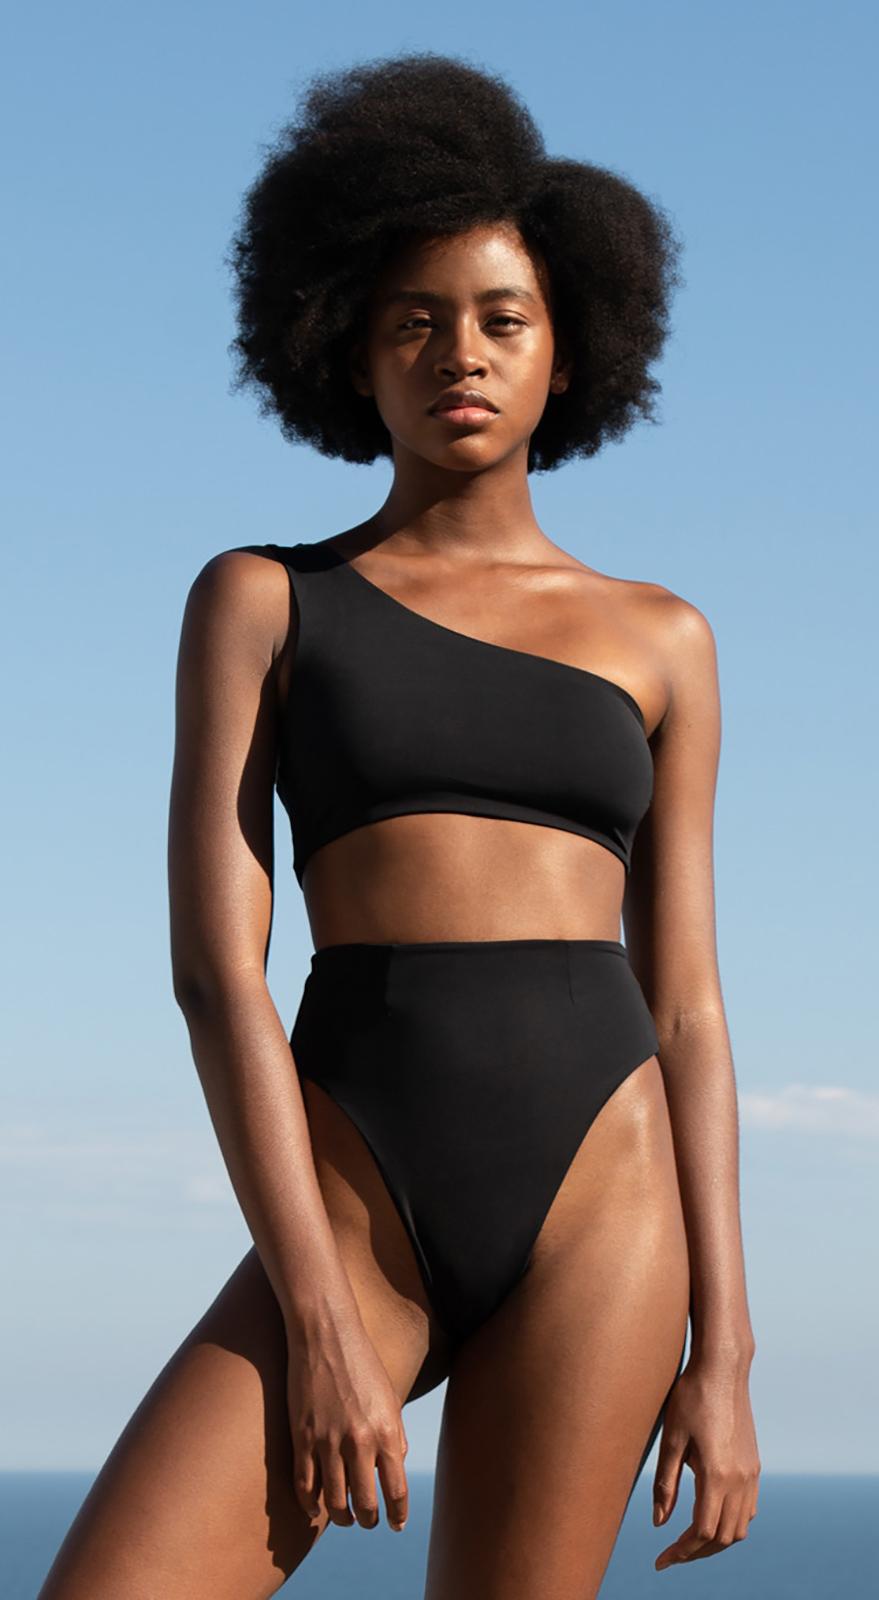 e058d0768e339 Luxurious Asymmetric Black High Leg Bikini - Crepe Perlin Bikini Preto -  HAIGHT